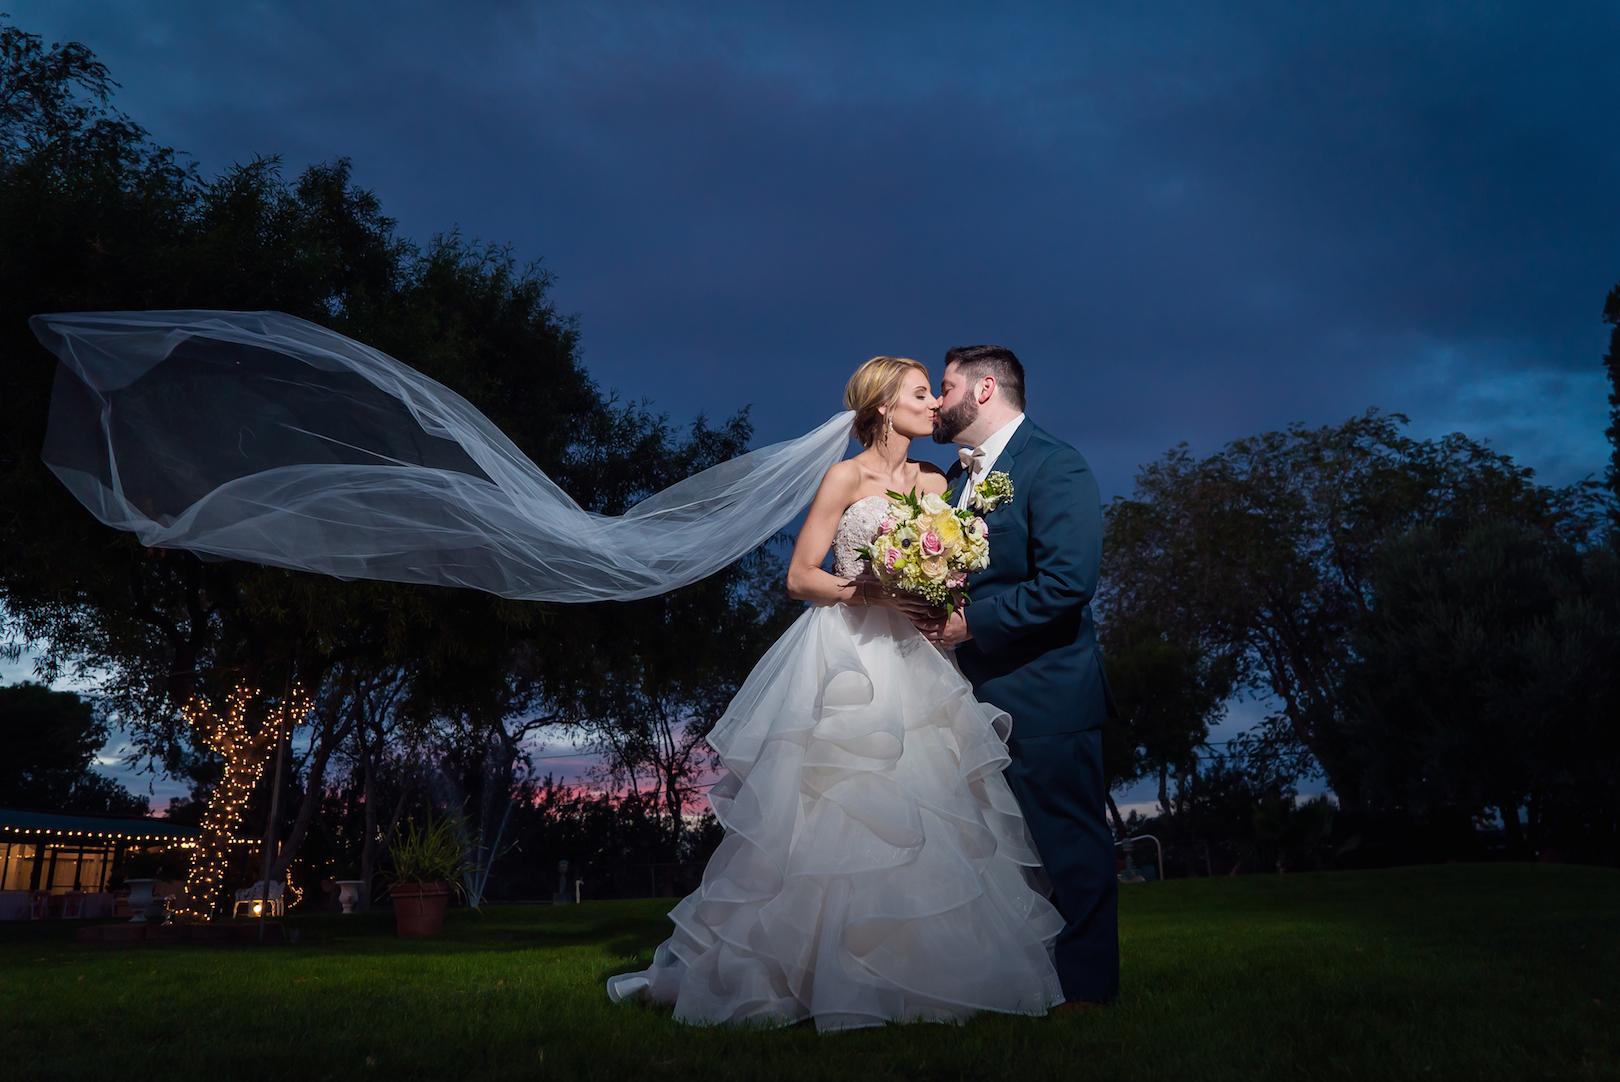 Bridal Spectacular_www.highclassstudios.com-amandaandcory_selects-147